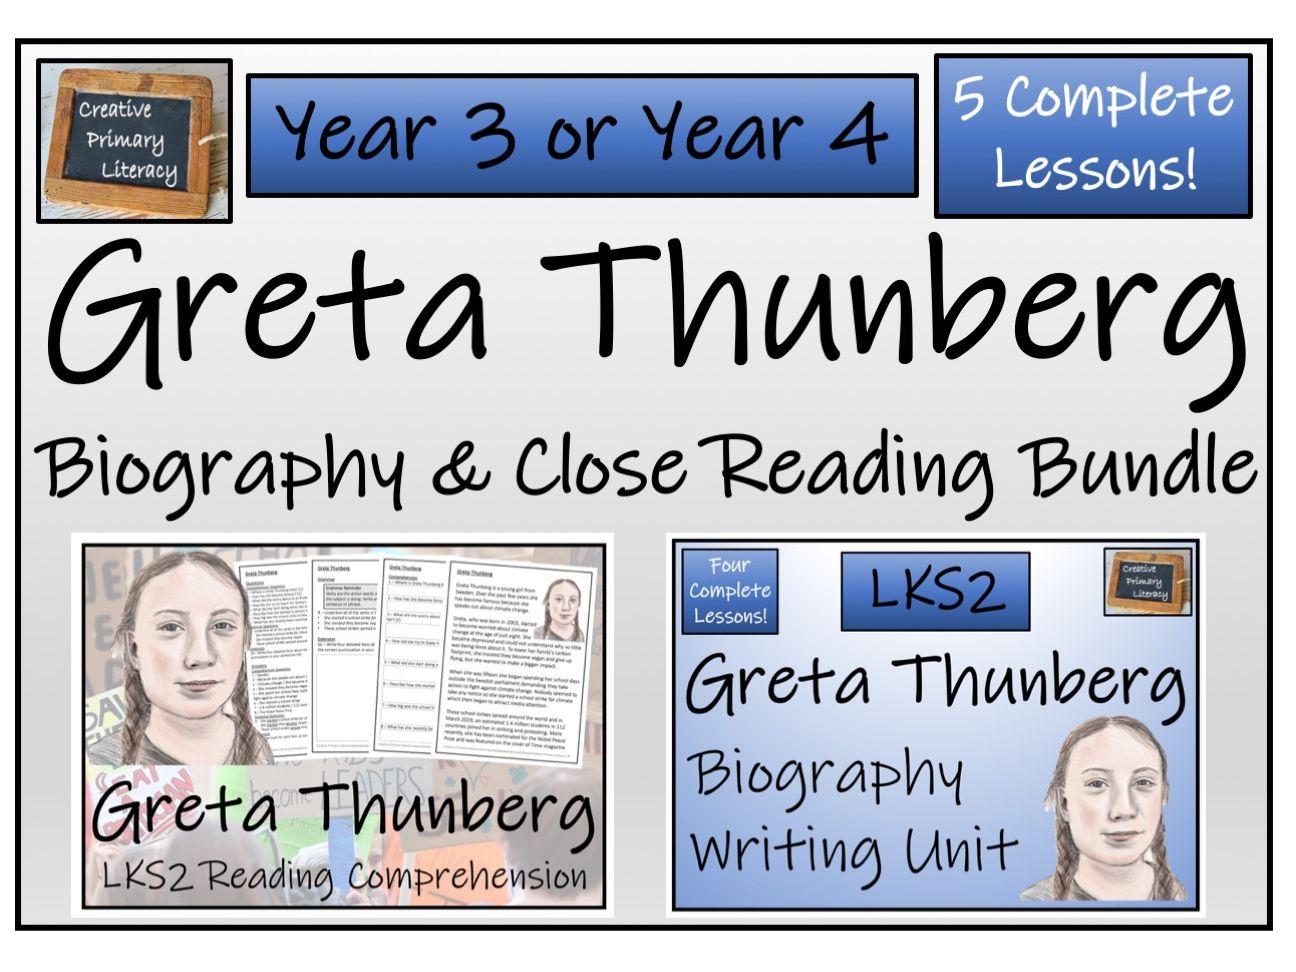 LKS2 Literacy - Greta Thunberg Reading Comprehension & Biography Bundle